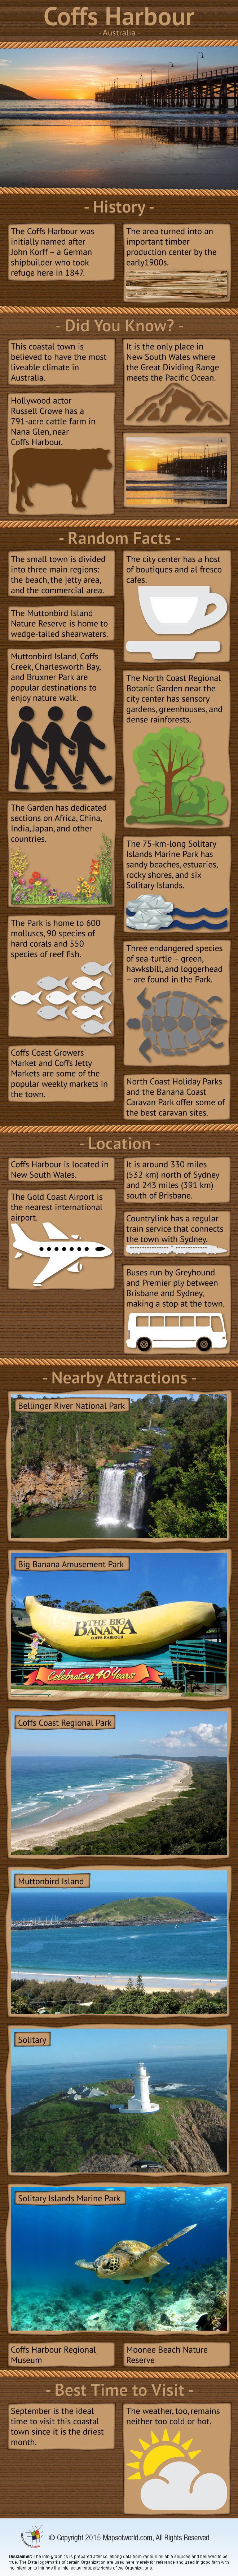 Coffs Harbour Infographic